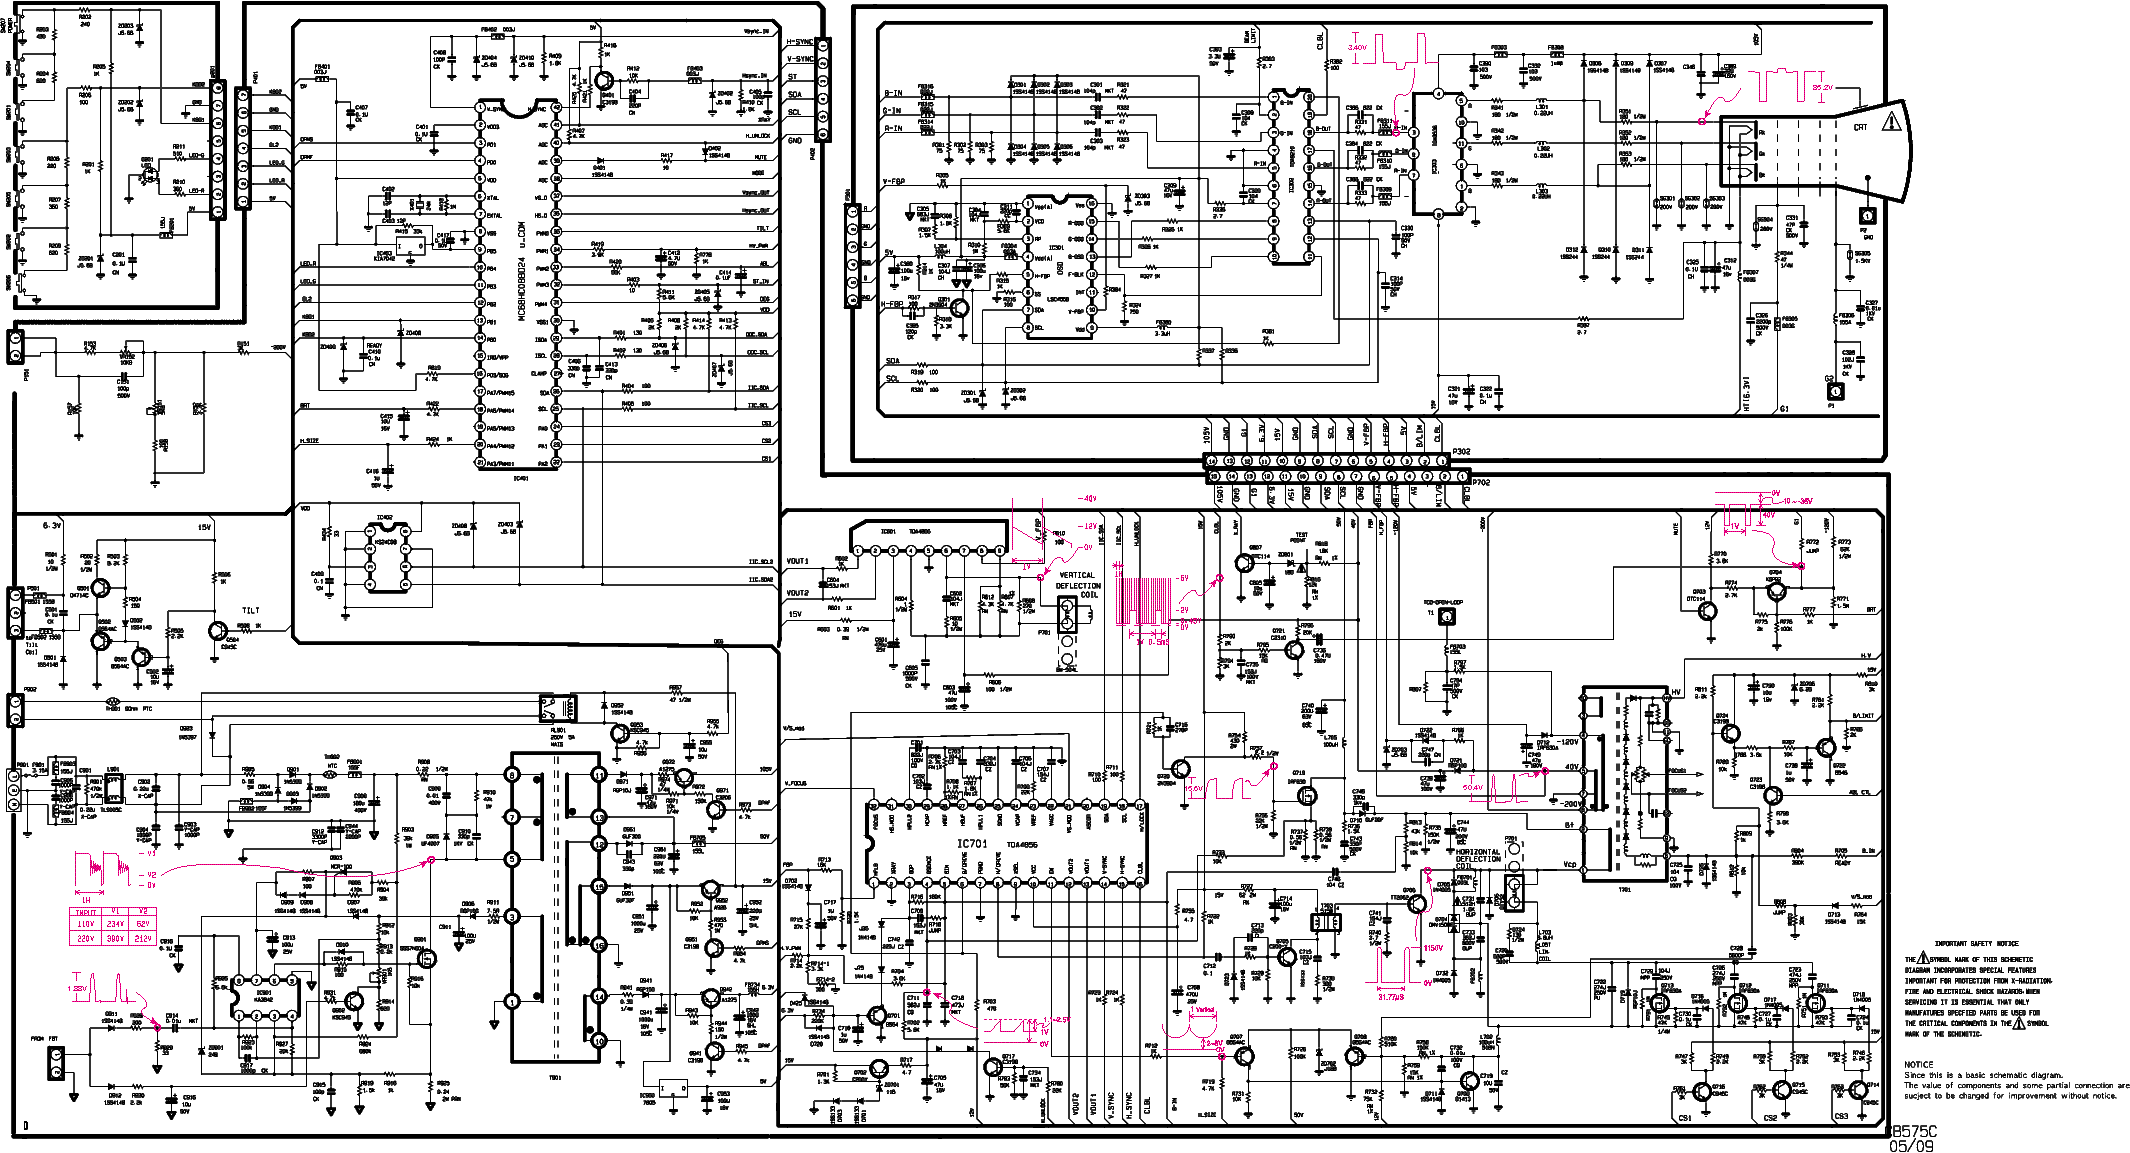 Lg flatron 775ft схема